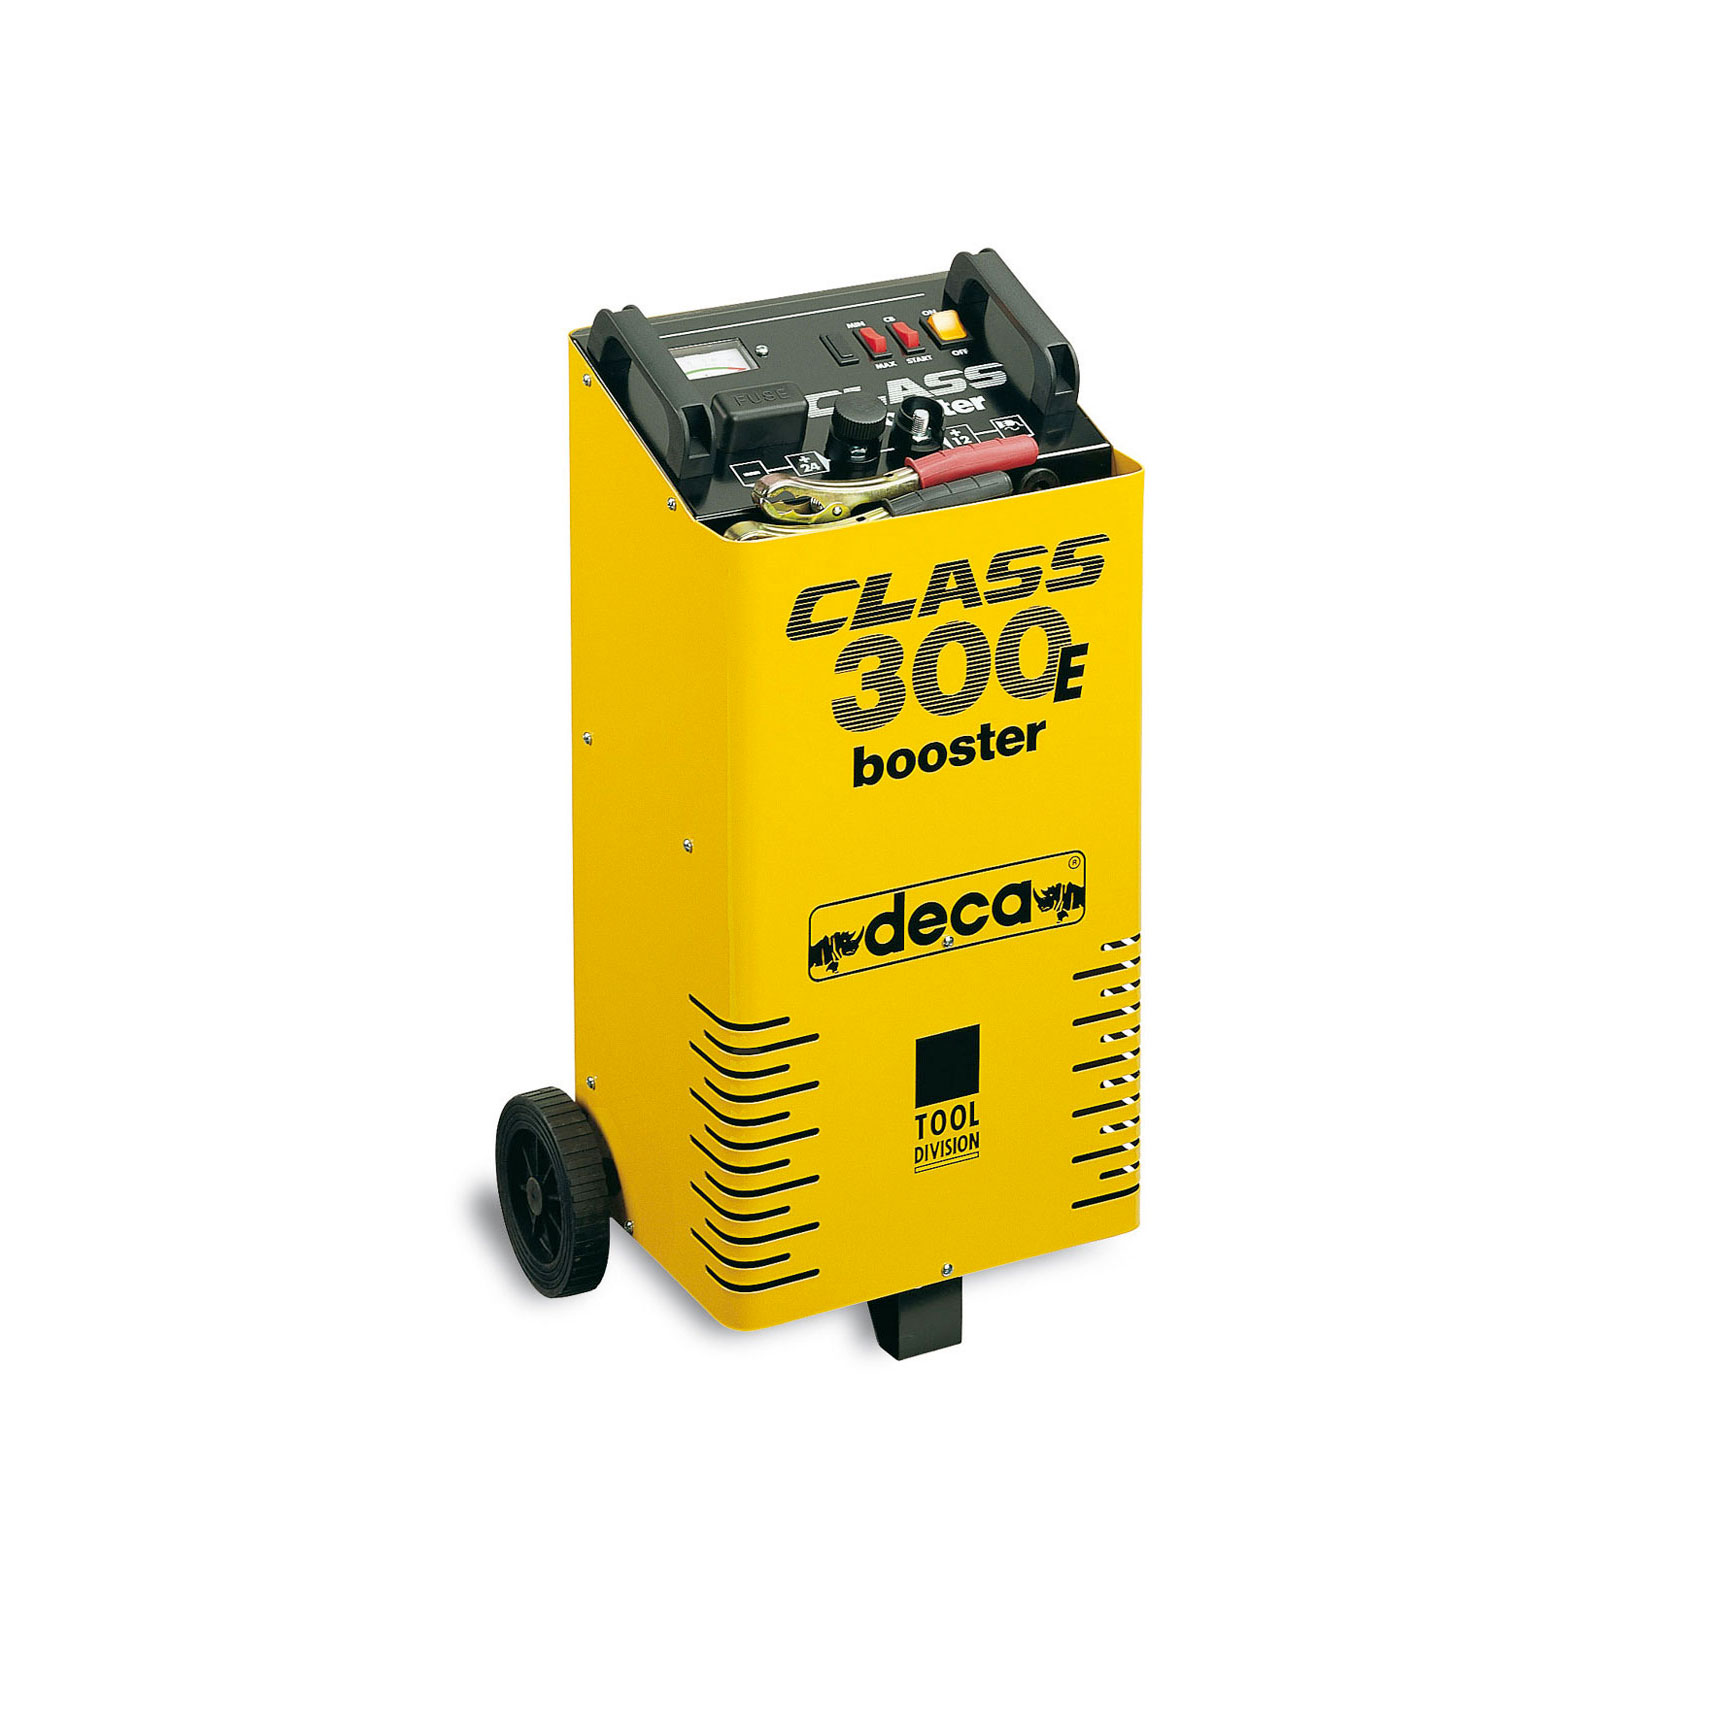 Chargeur Demarreur Batterie Deca Class Booster 300E